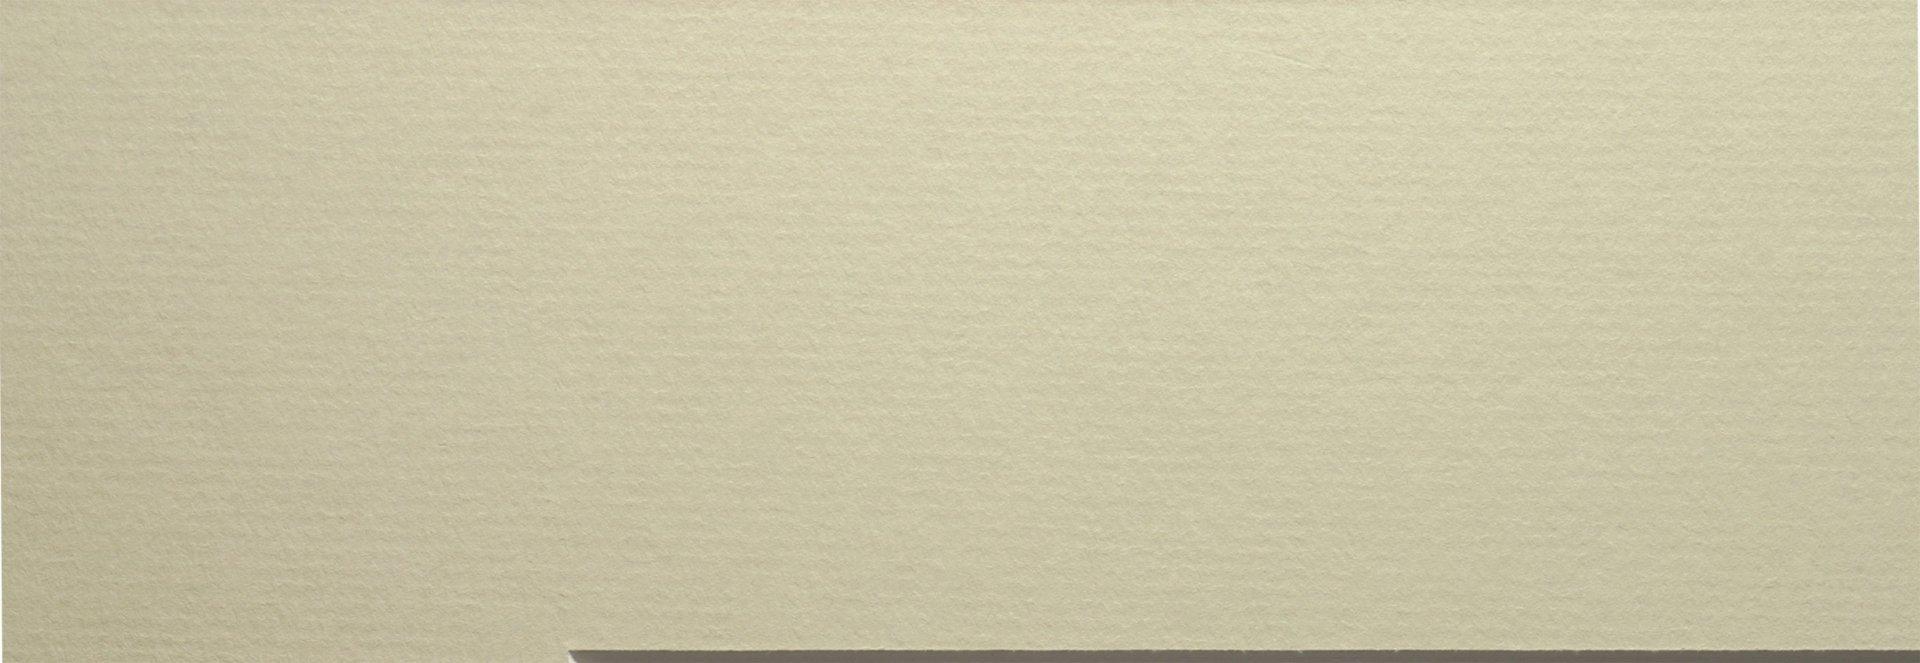 GSRM1089_G1089 Sauterne